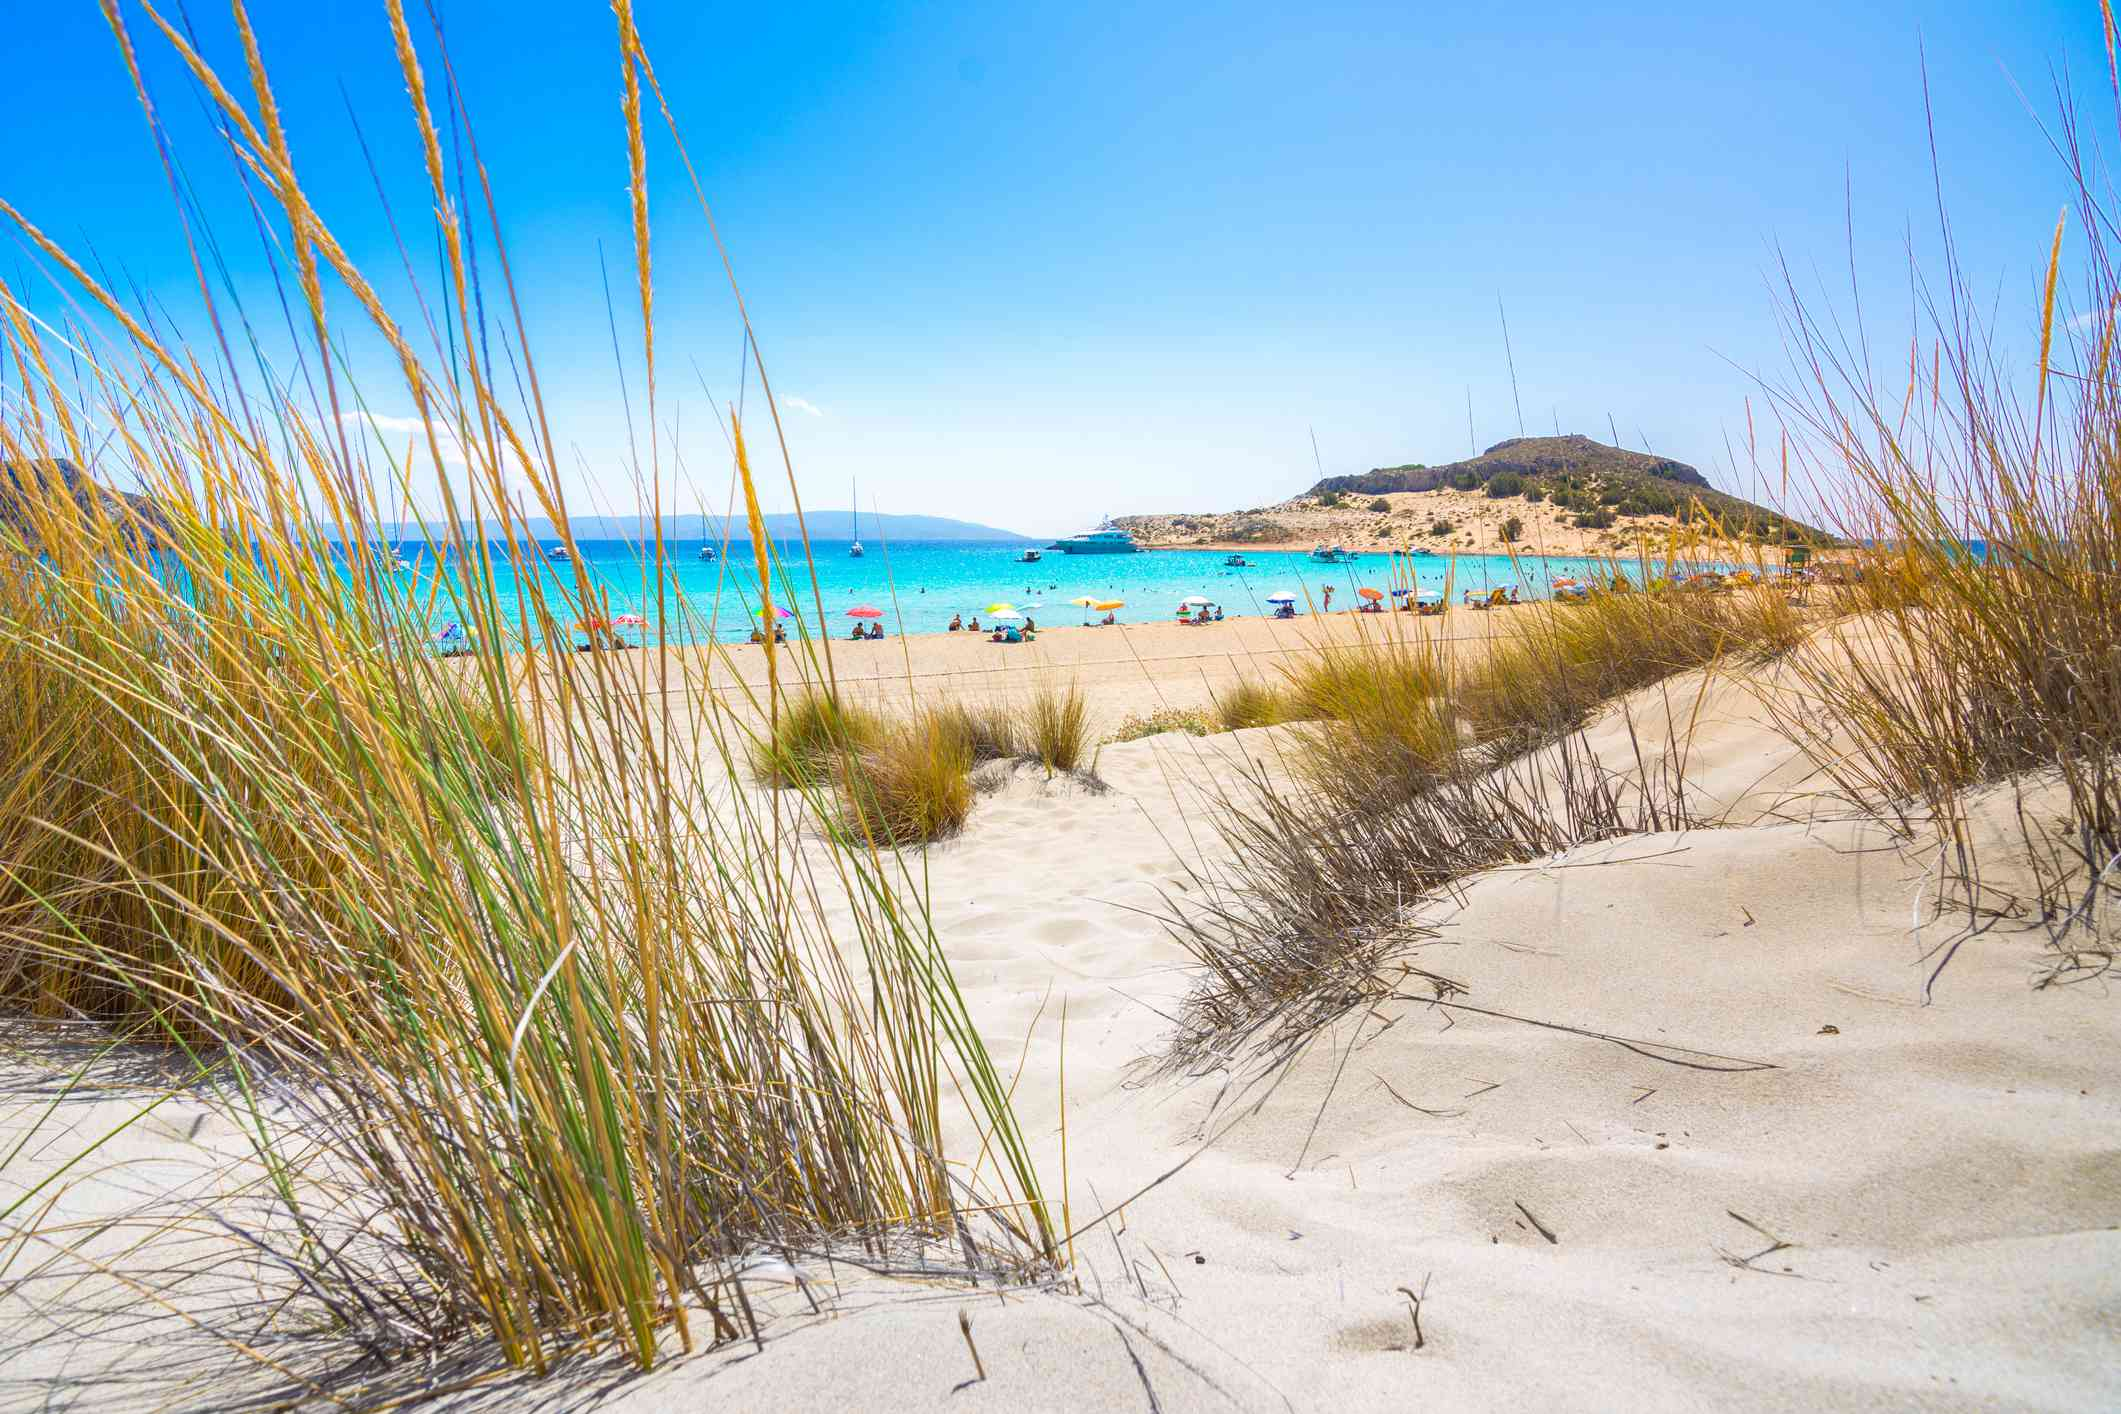 Amazing tropical sandy beach of Simos on Elafonissos island, Peloponnese, Greece.